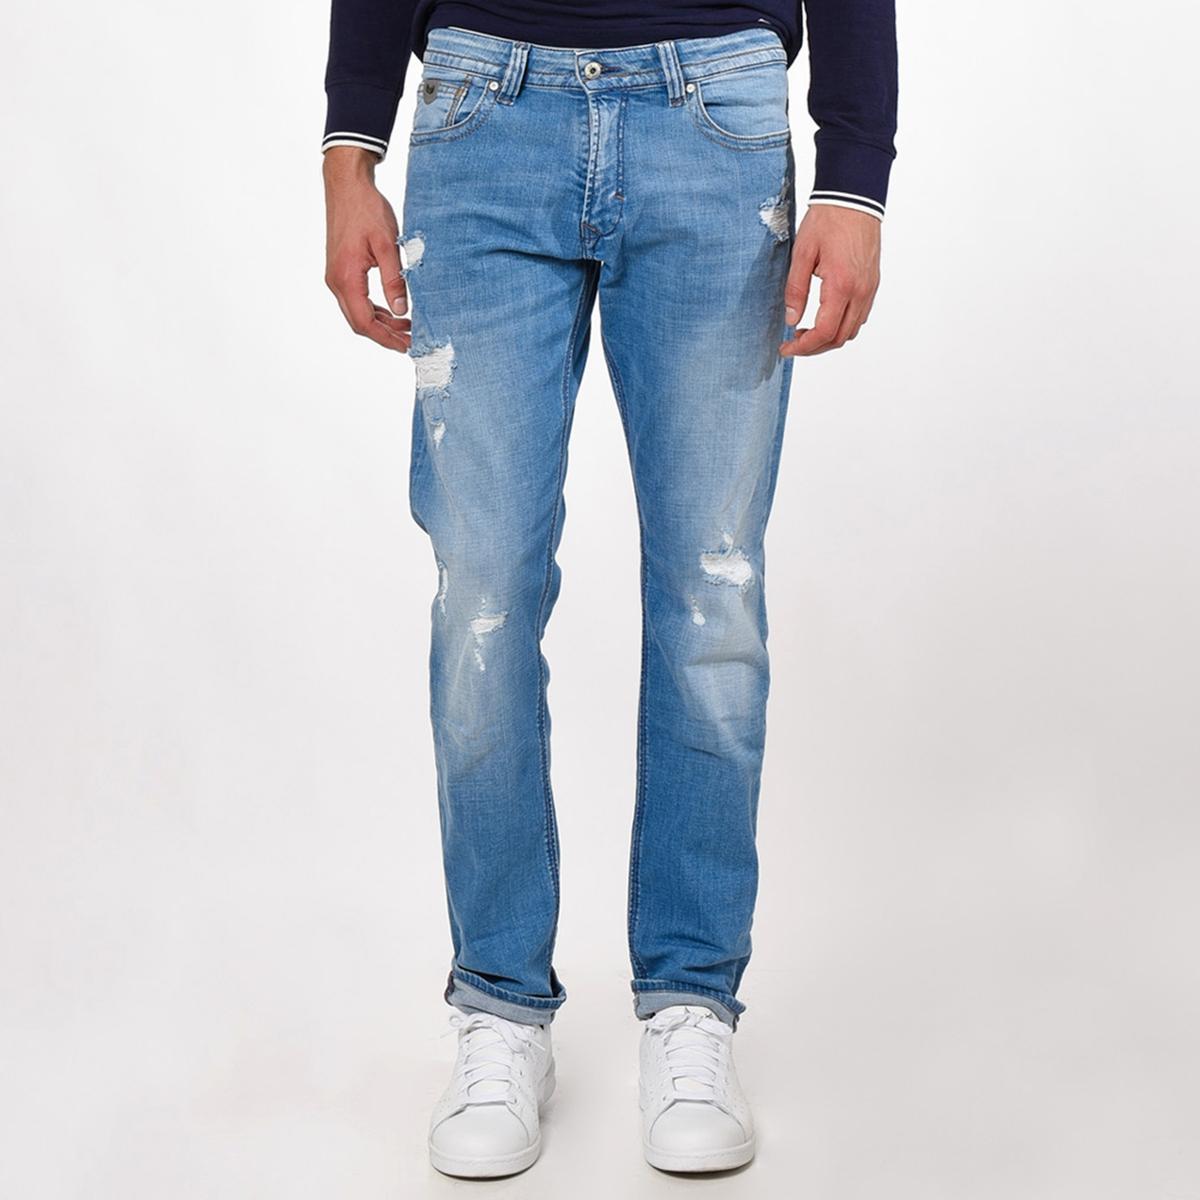 Jeans corte straight, rasgados, Broz, L34